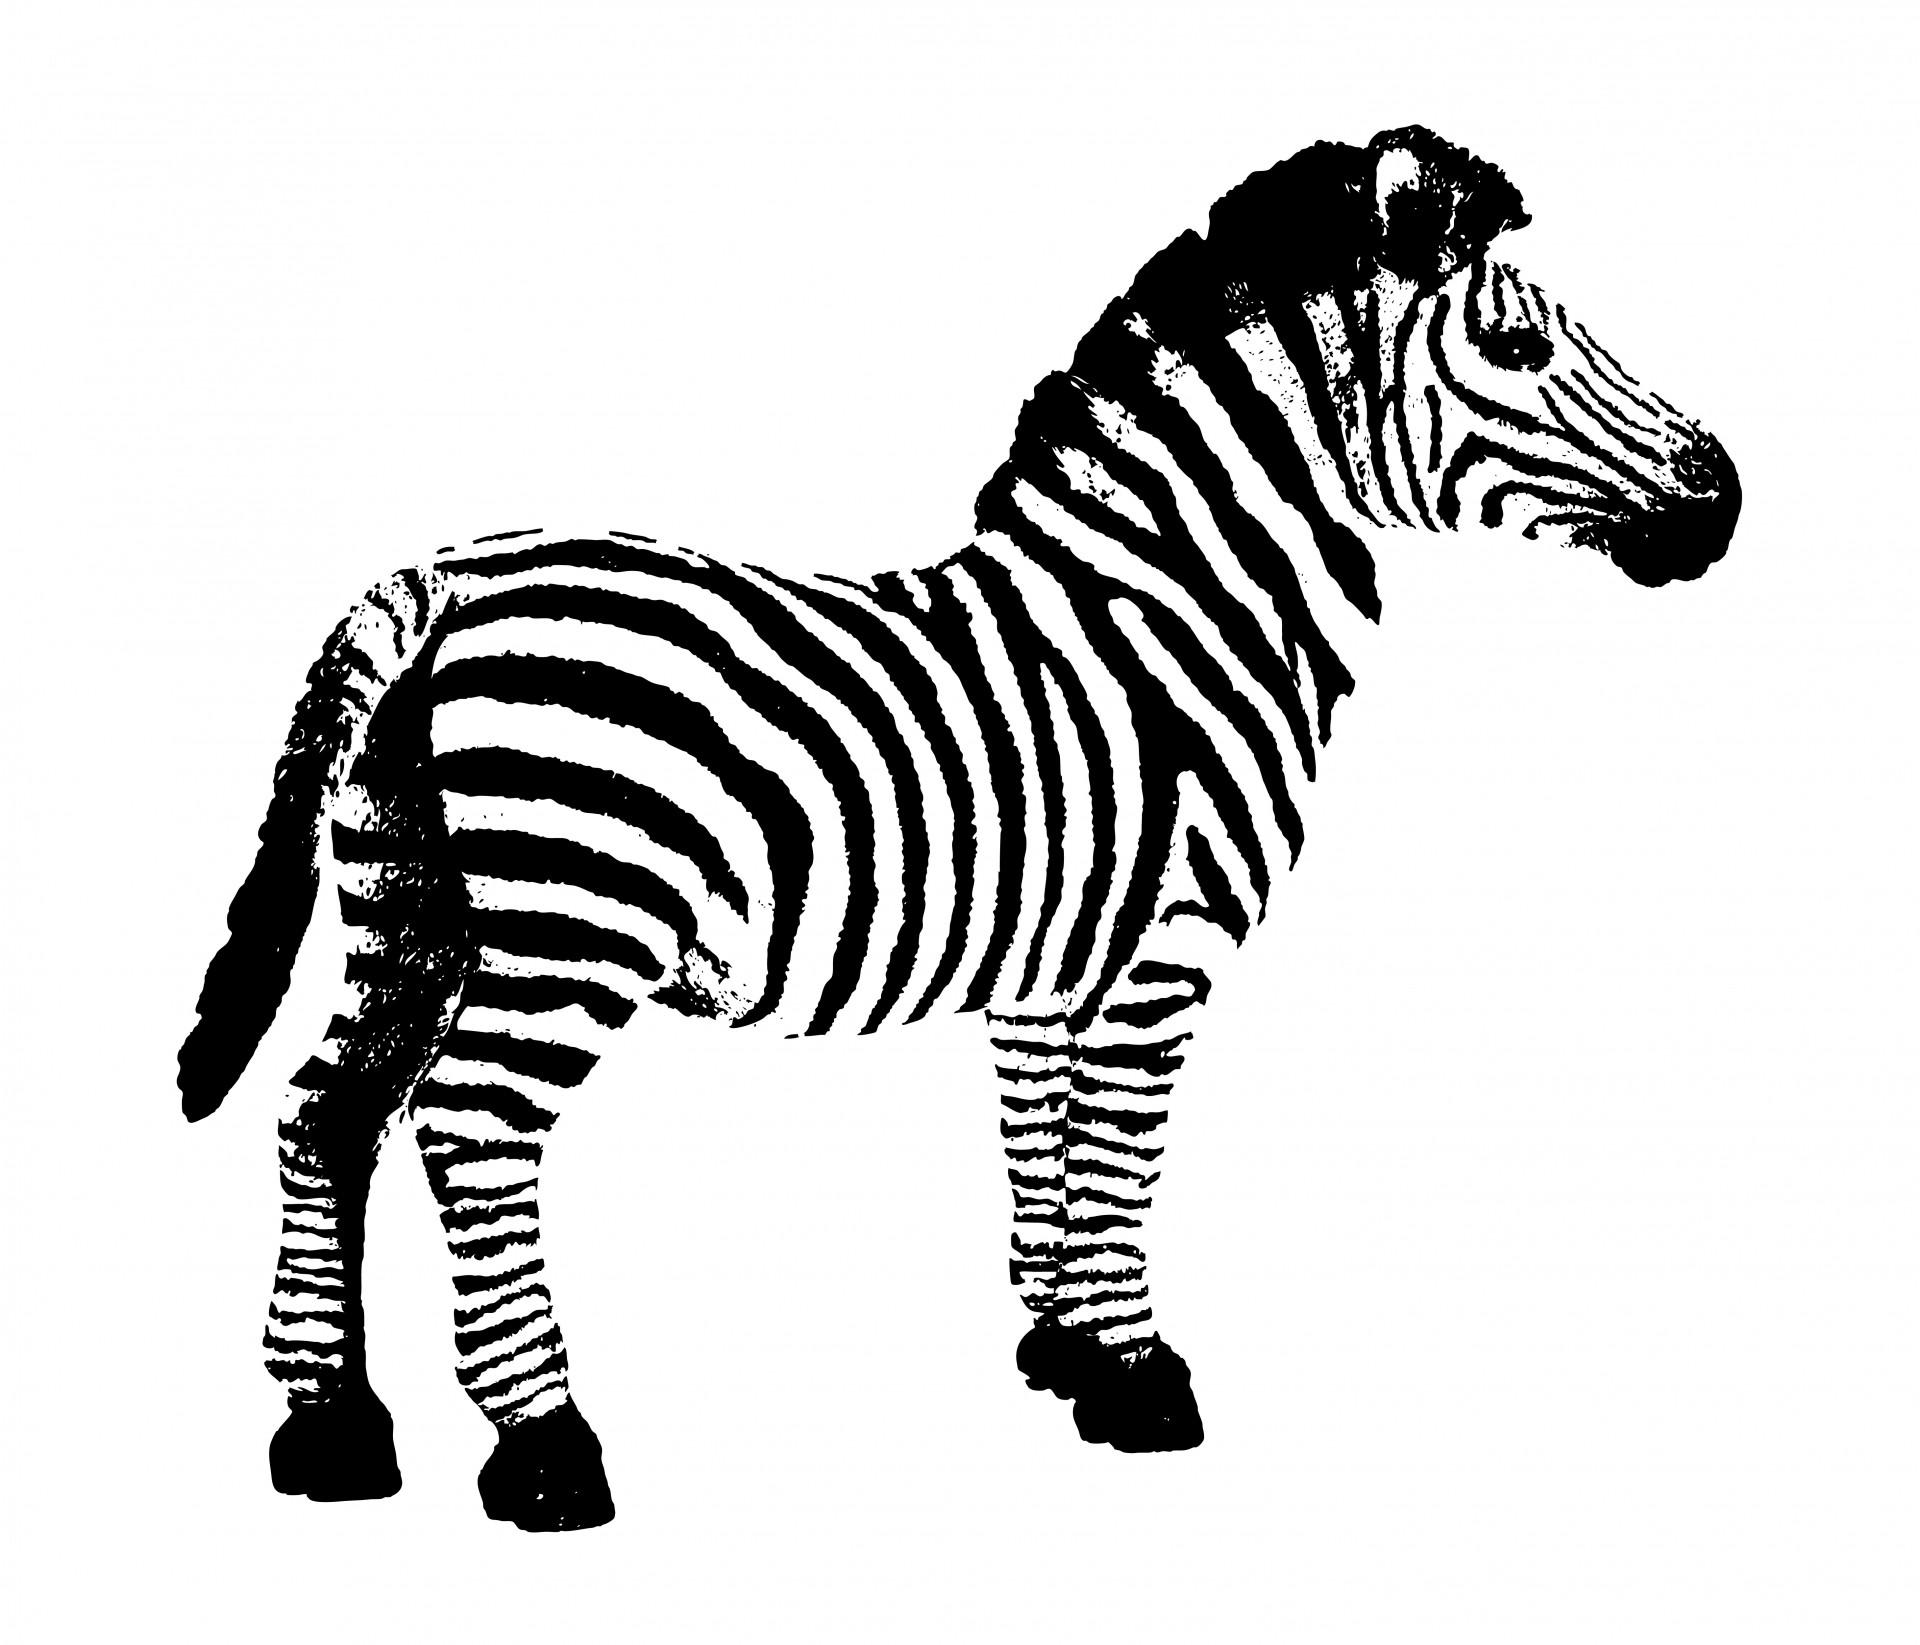 Zebra Clip Art Free - Cliparting Clipart-Zebra clip art free - Cliparting clipartall clipartall.com .-16